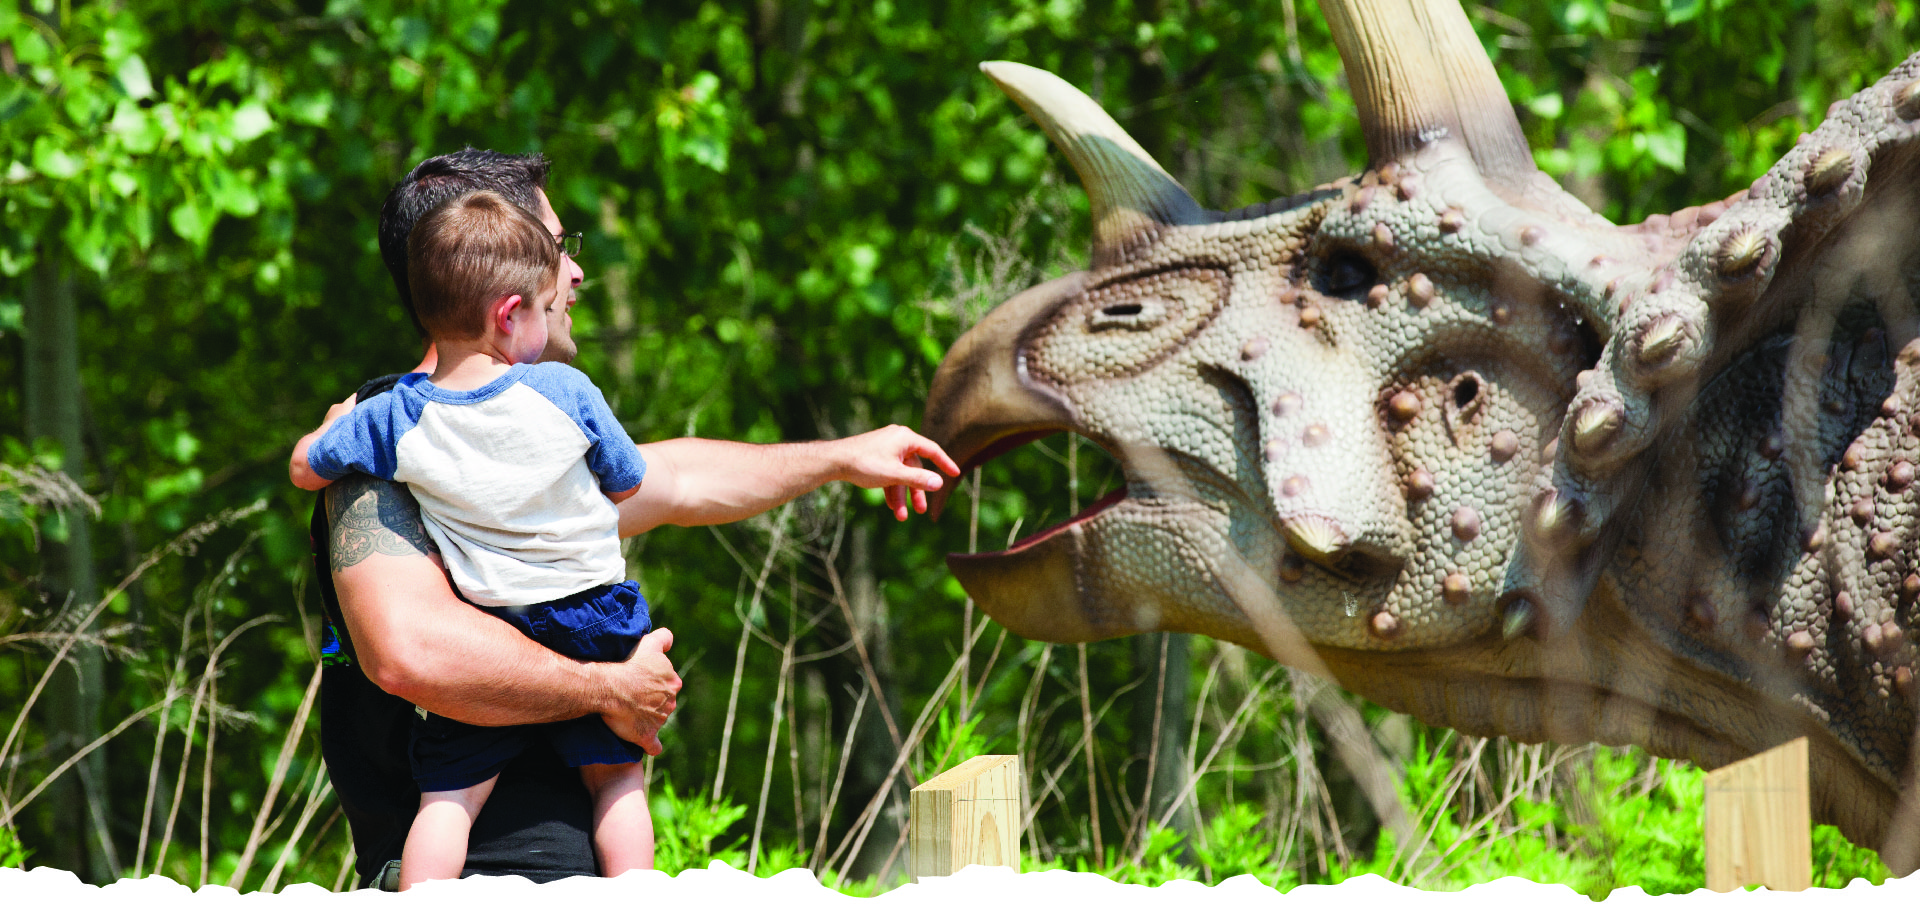 New Jersey Dinosaur Park